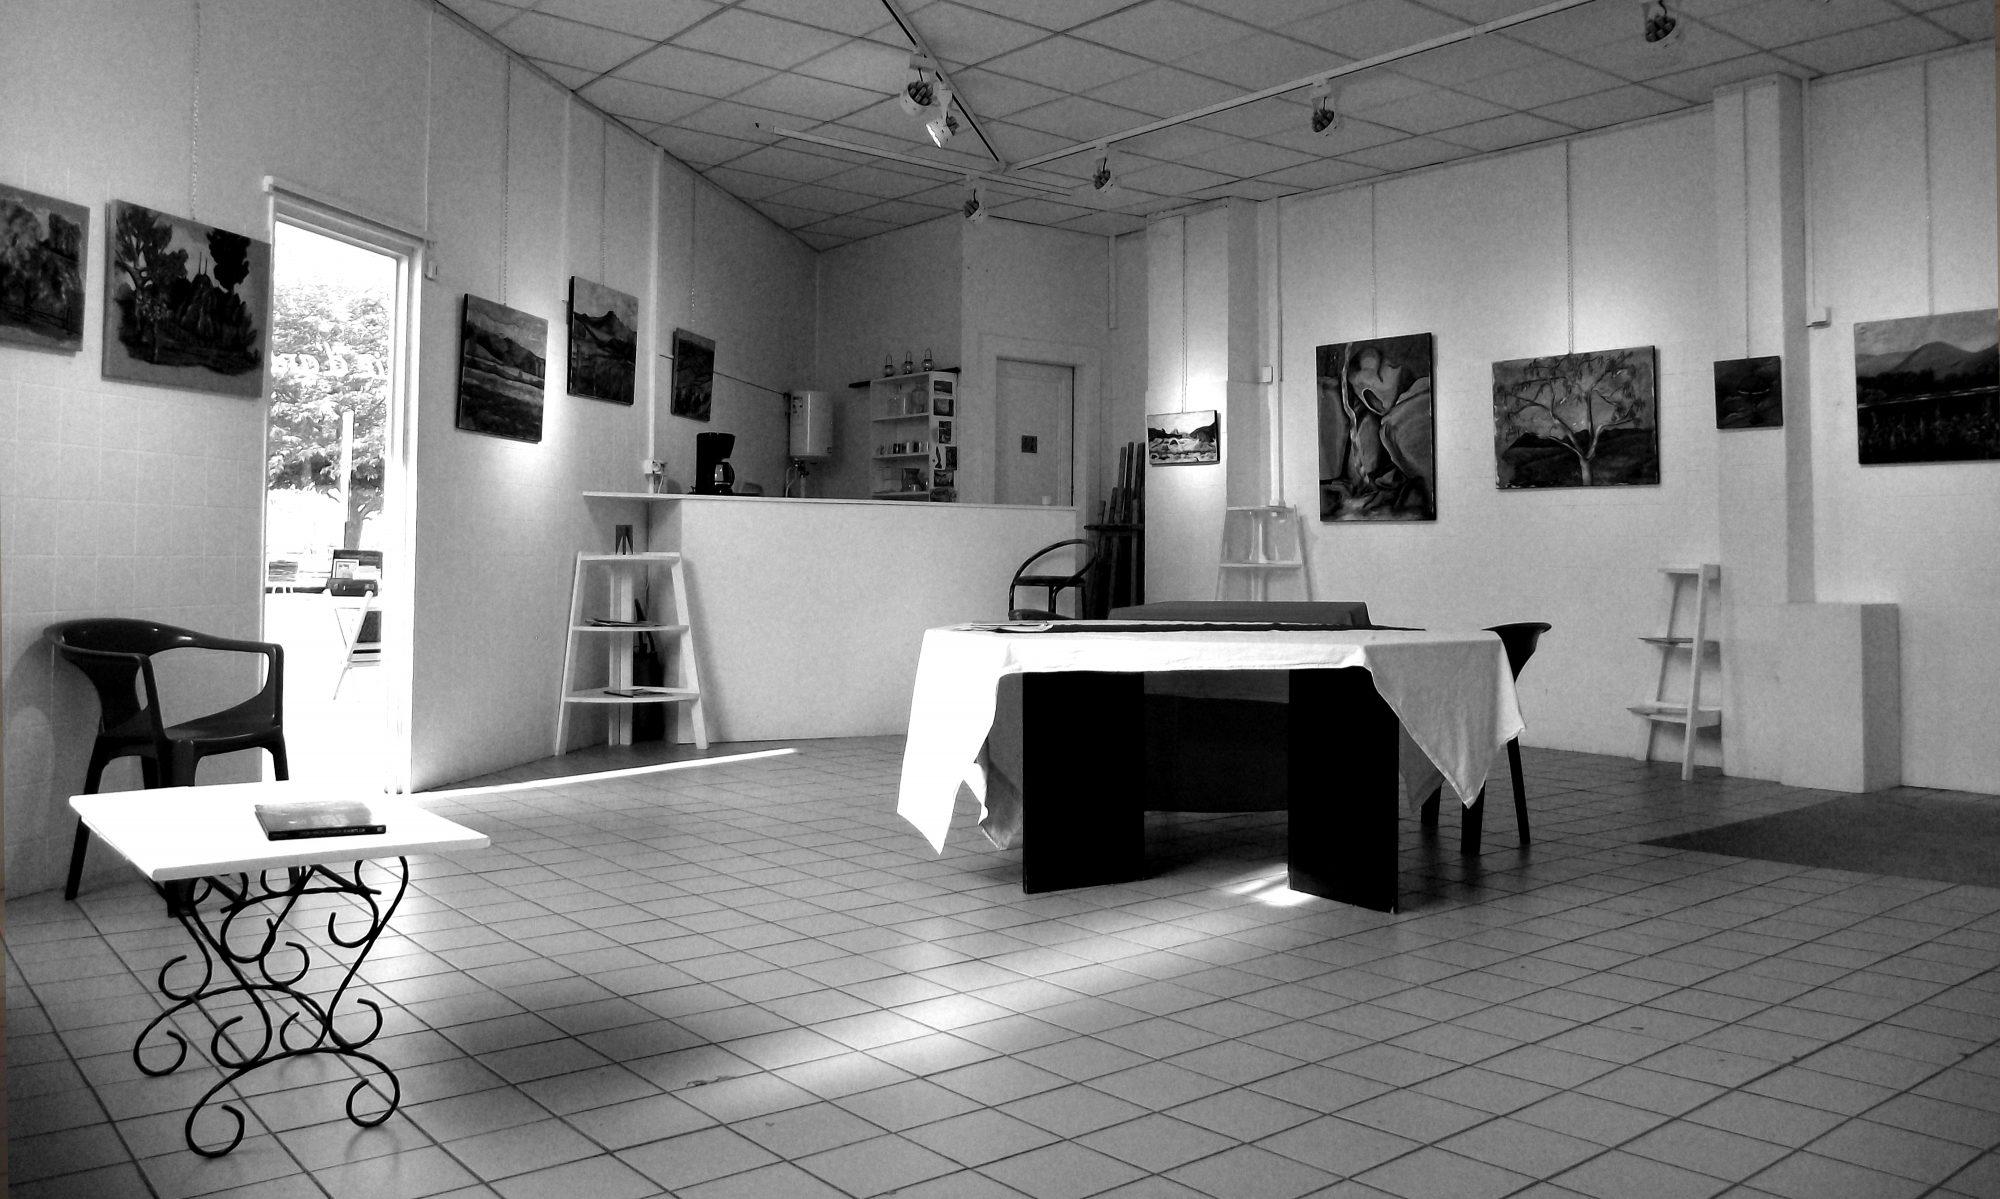 Galerie d'Art du Quai